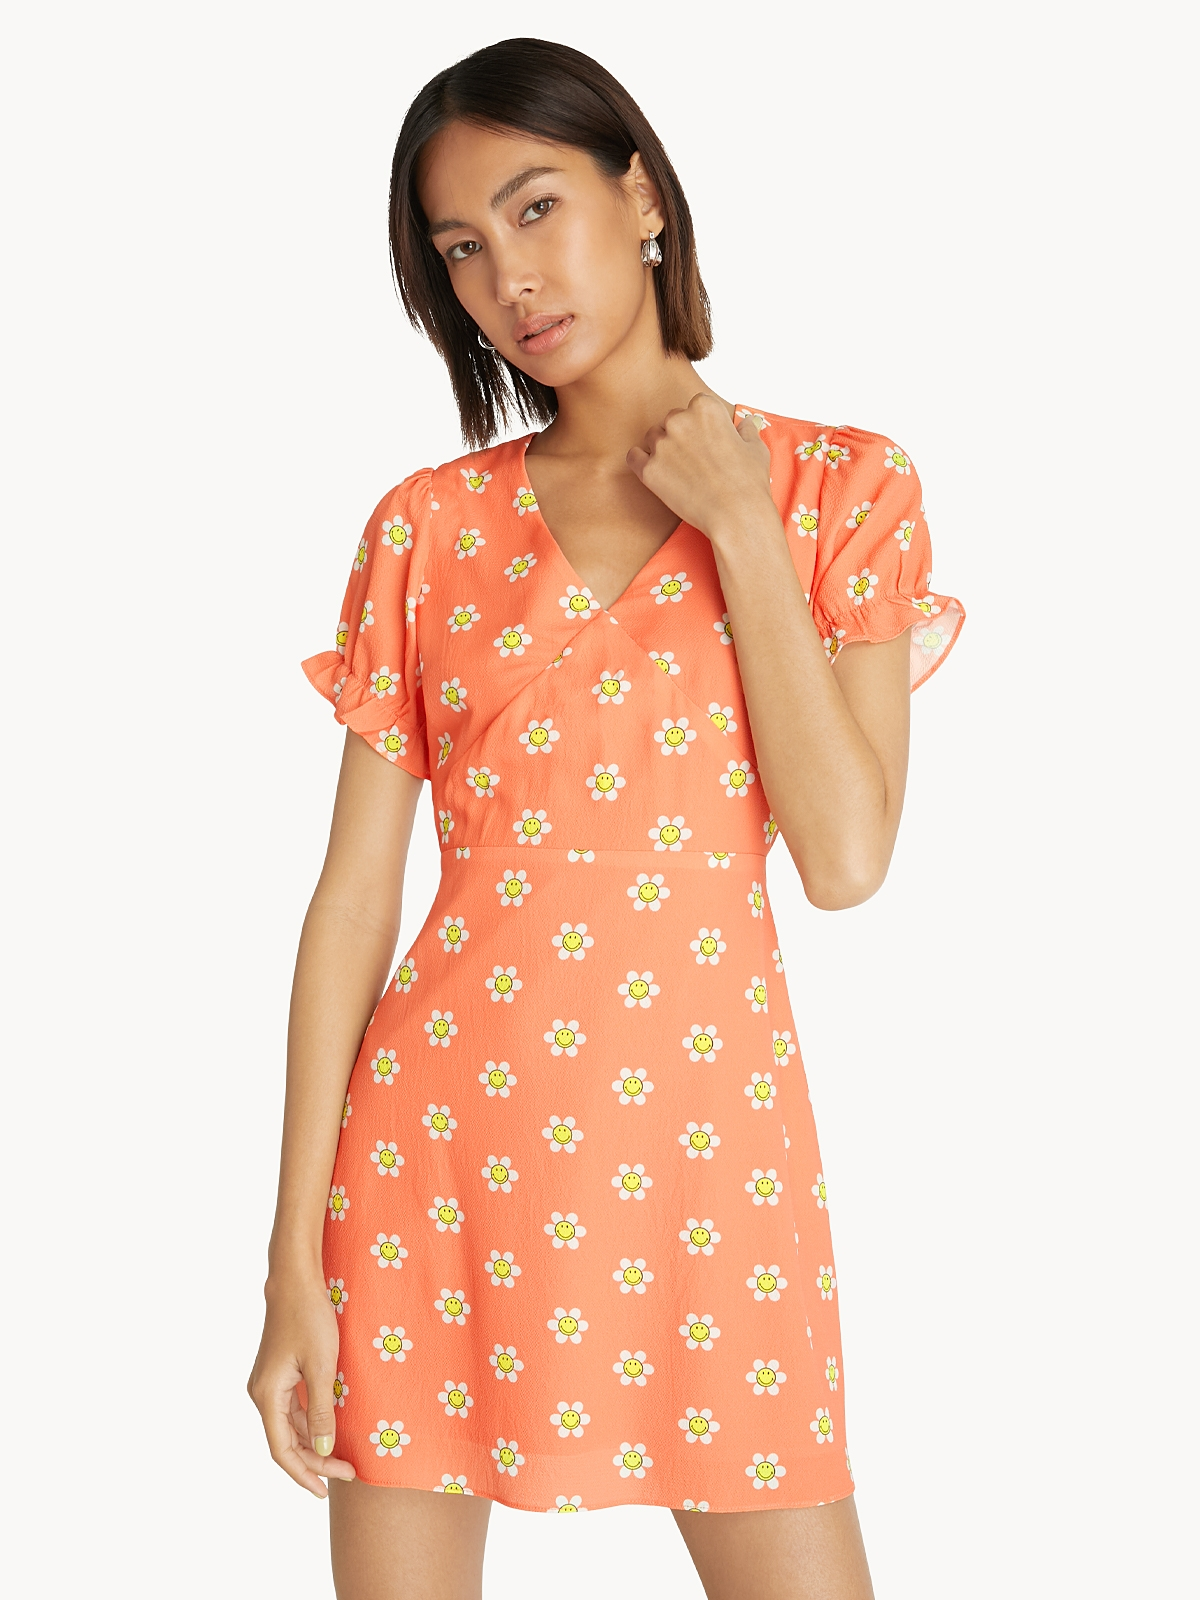 Pomelo x Smiley Open Back Dress Orange